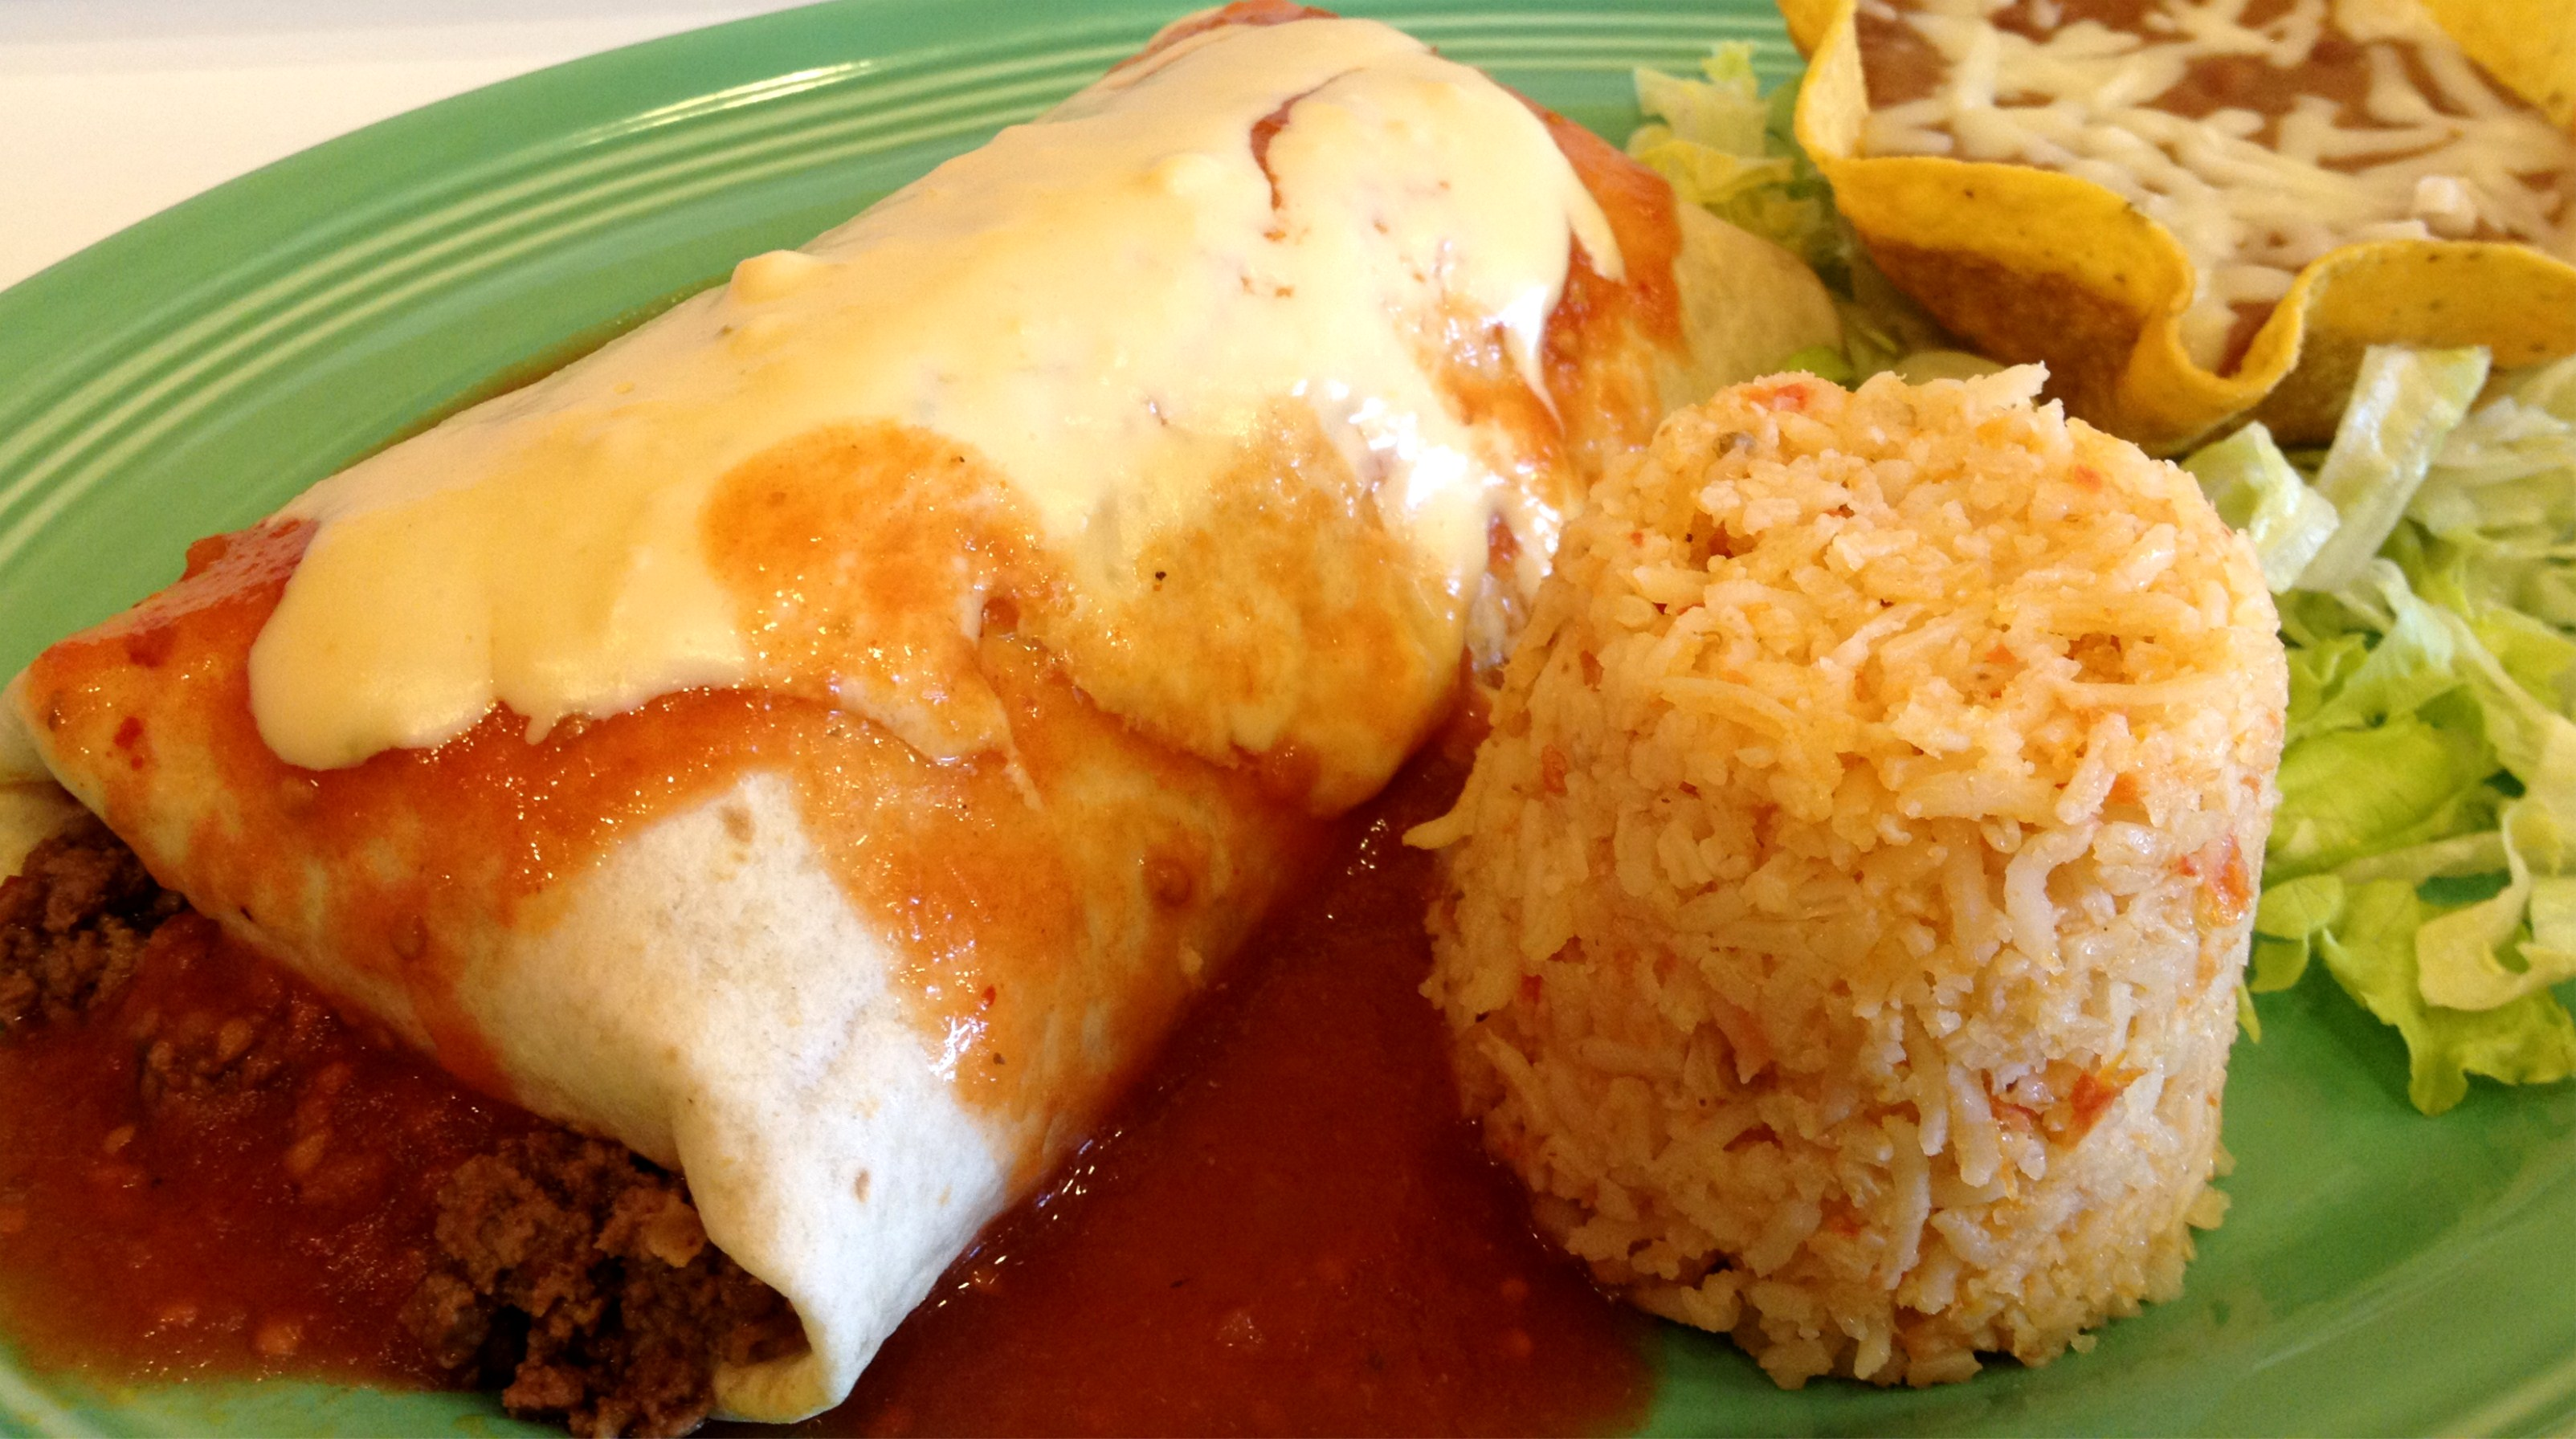 Burritos Steak Griled Chicken Carnitas Al Pastor for 6